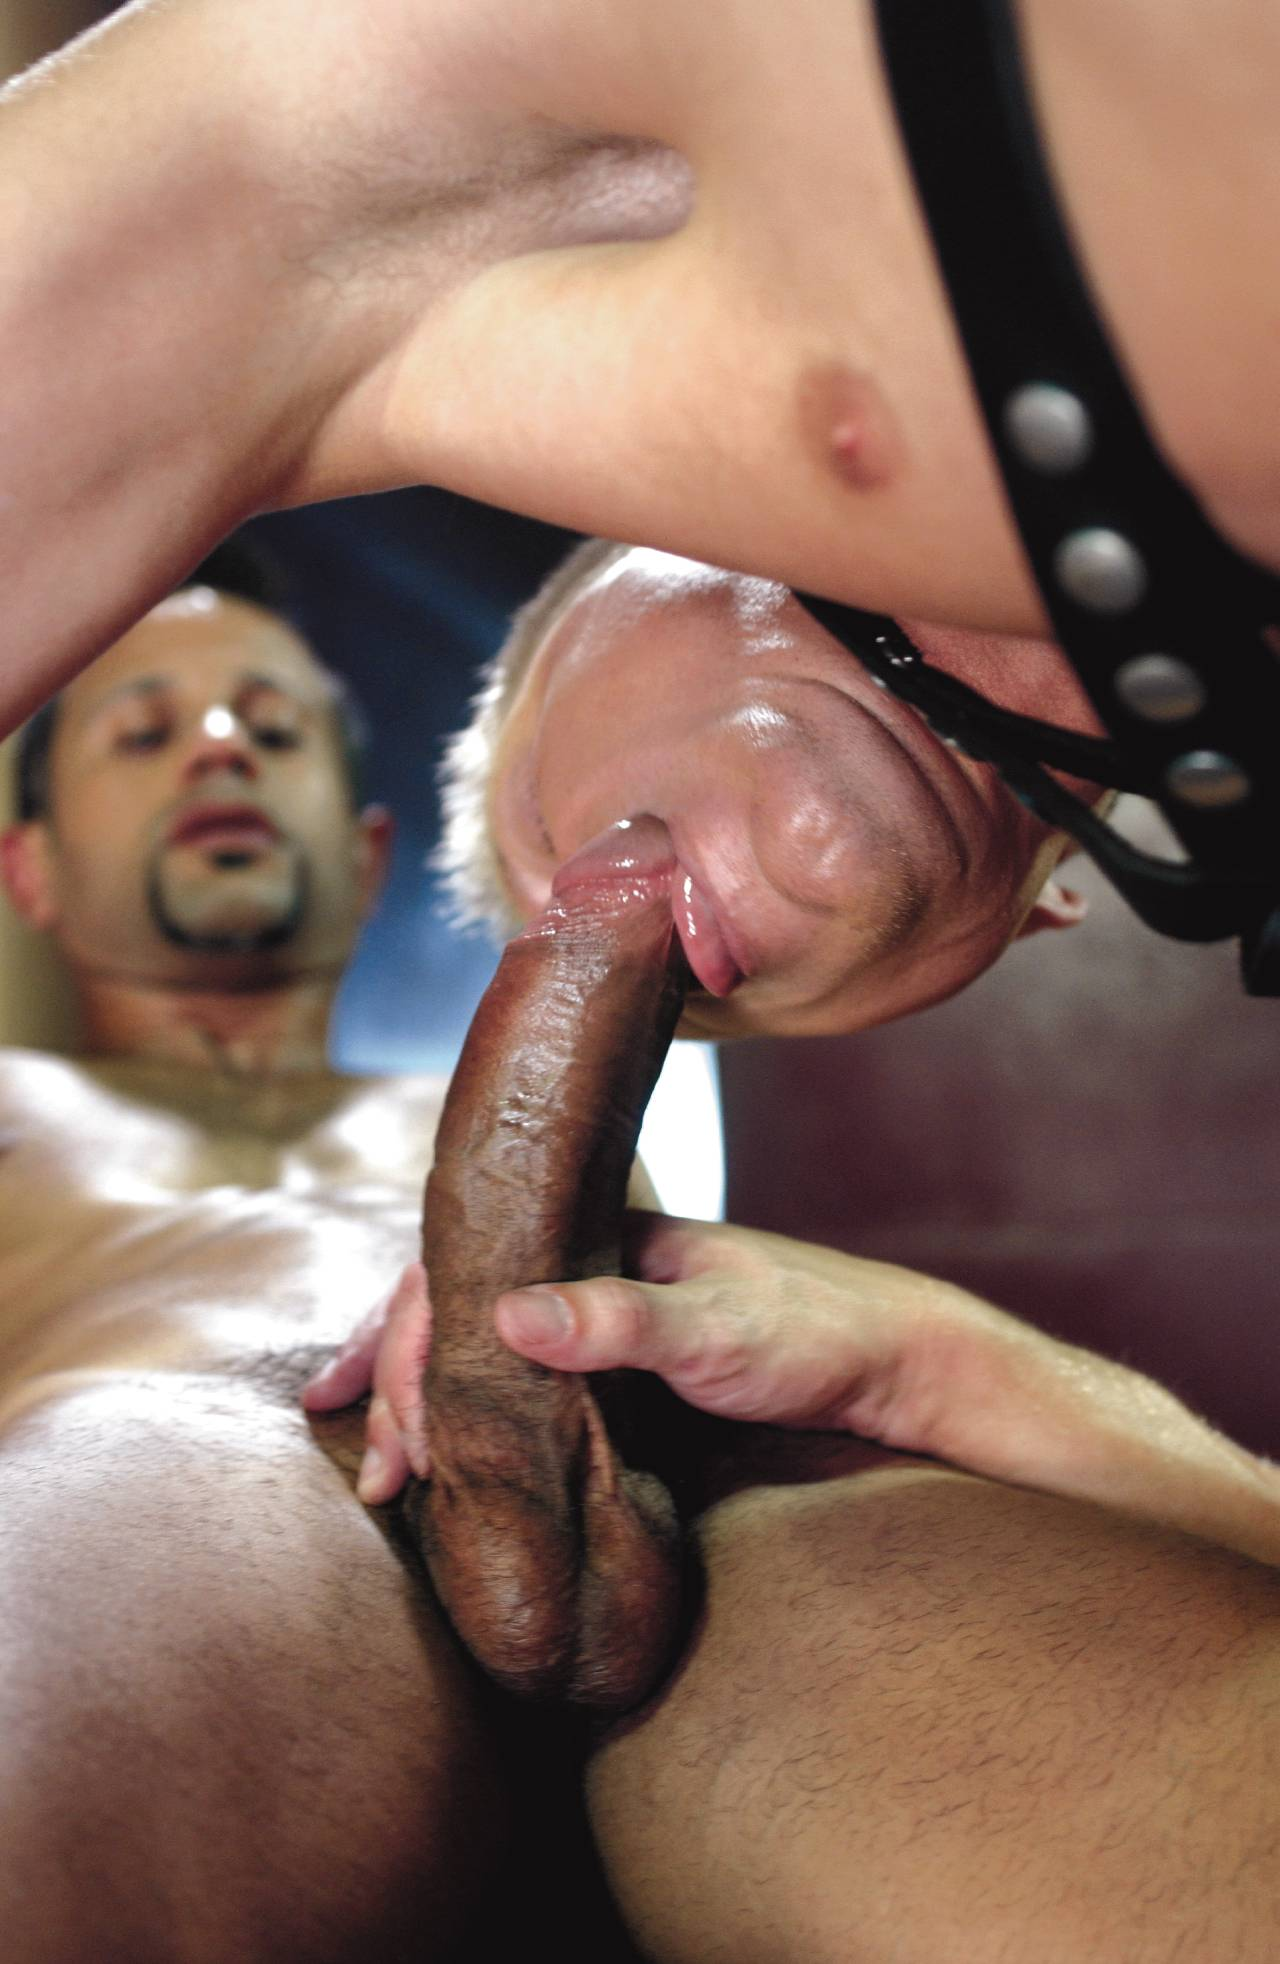 Brad patton orgy